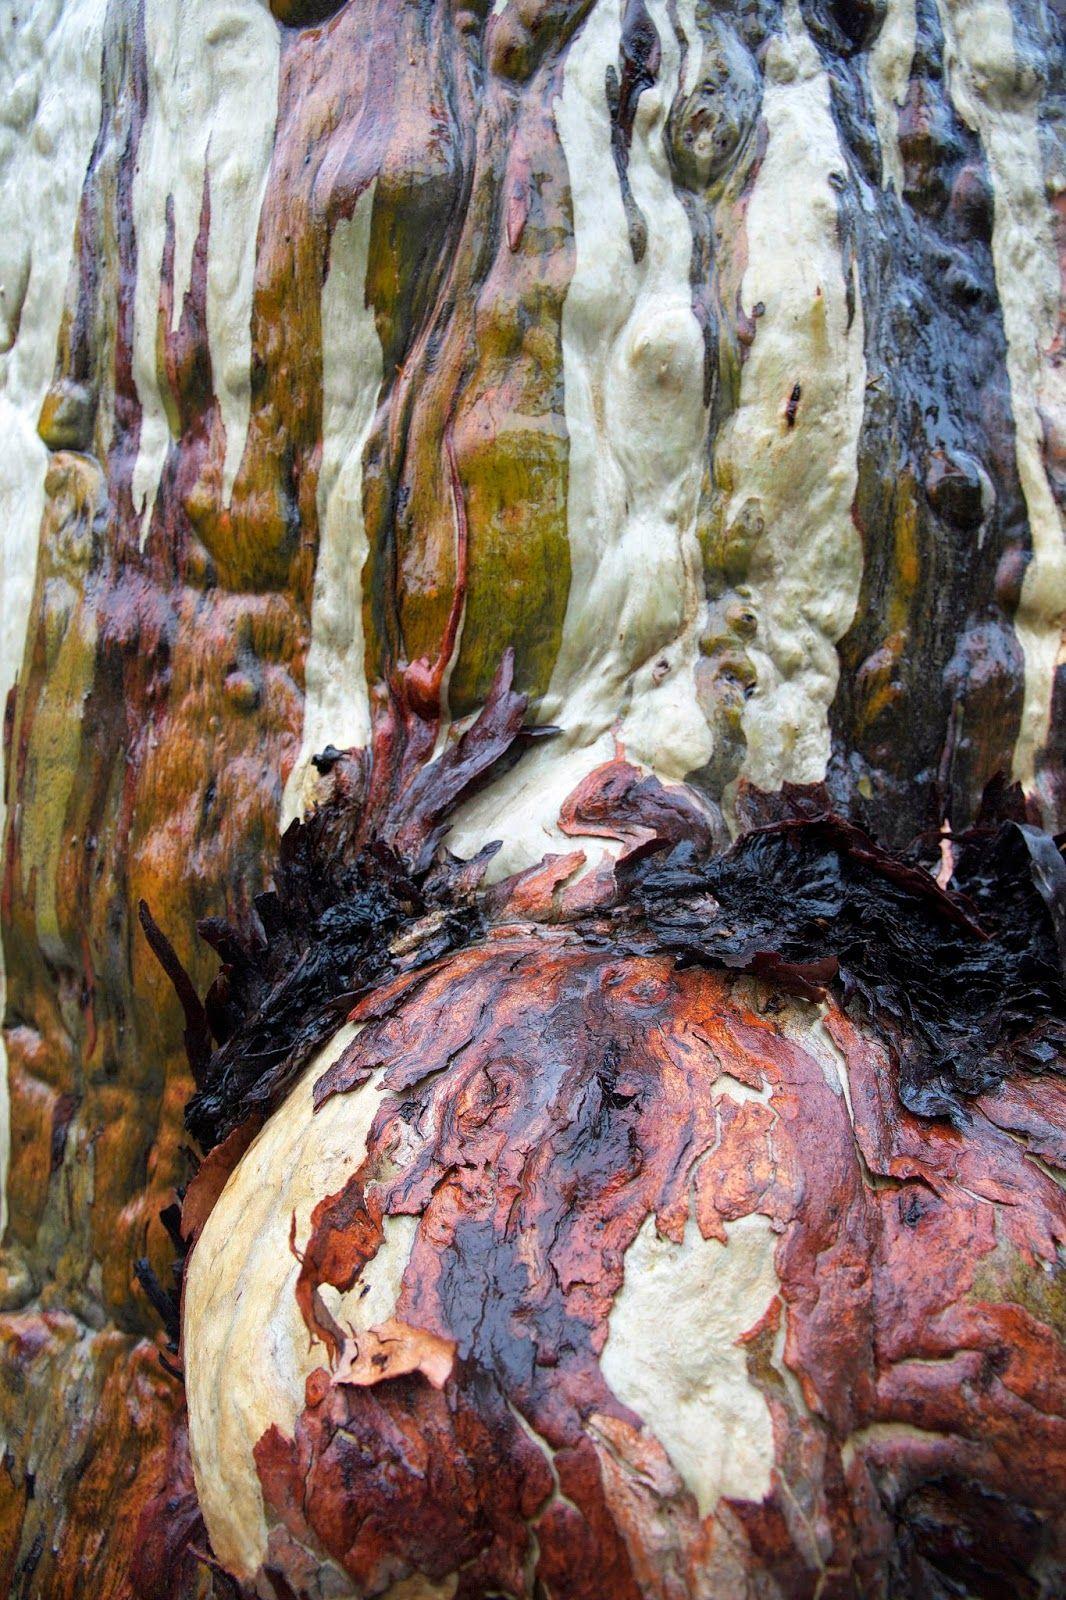 Amazing bark of a Tasmanian Snow Gum, Eucalyptus coccifera